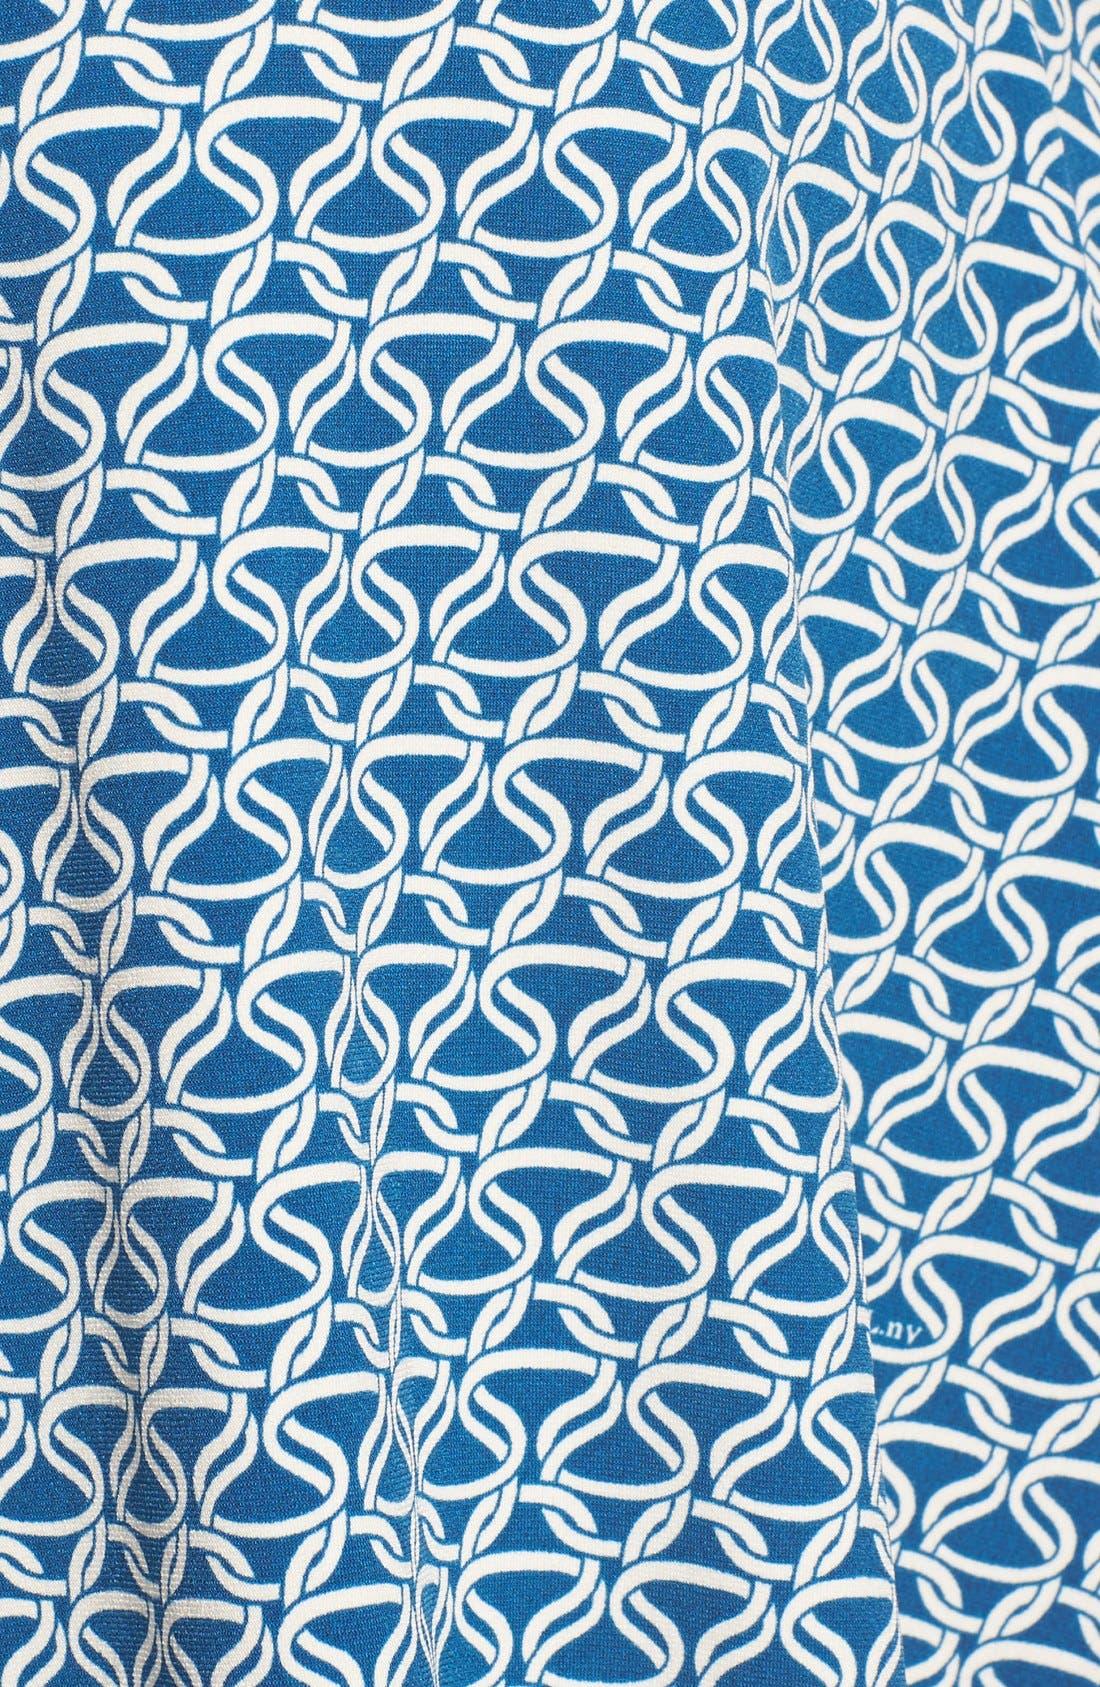 'Ilana' Belted Maternity Dress,                             Alternate thumbnail 49, color,